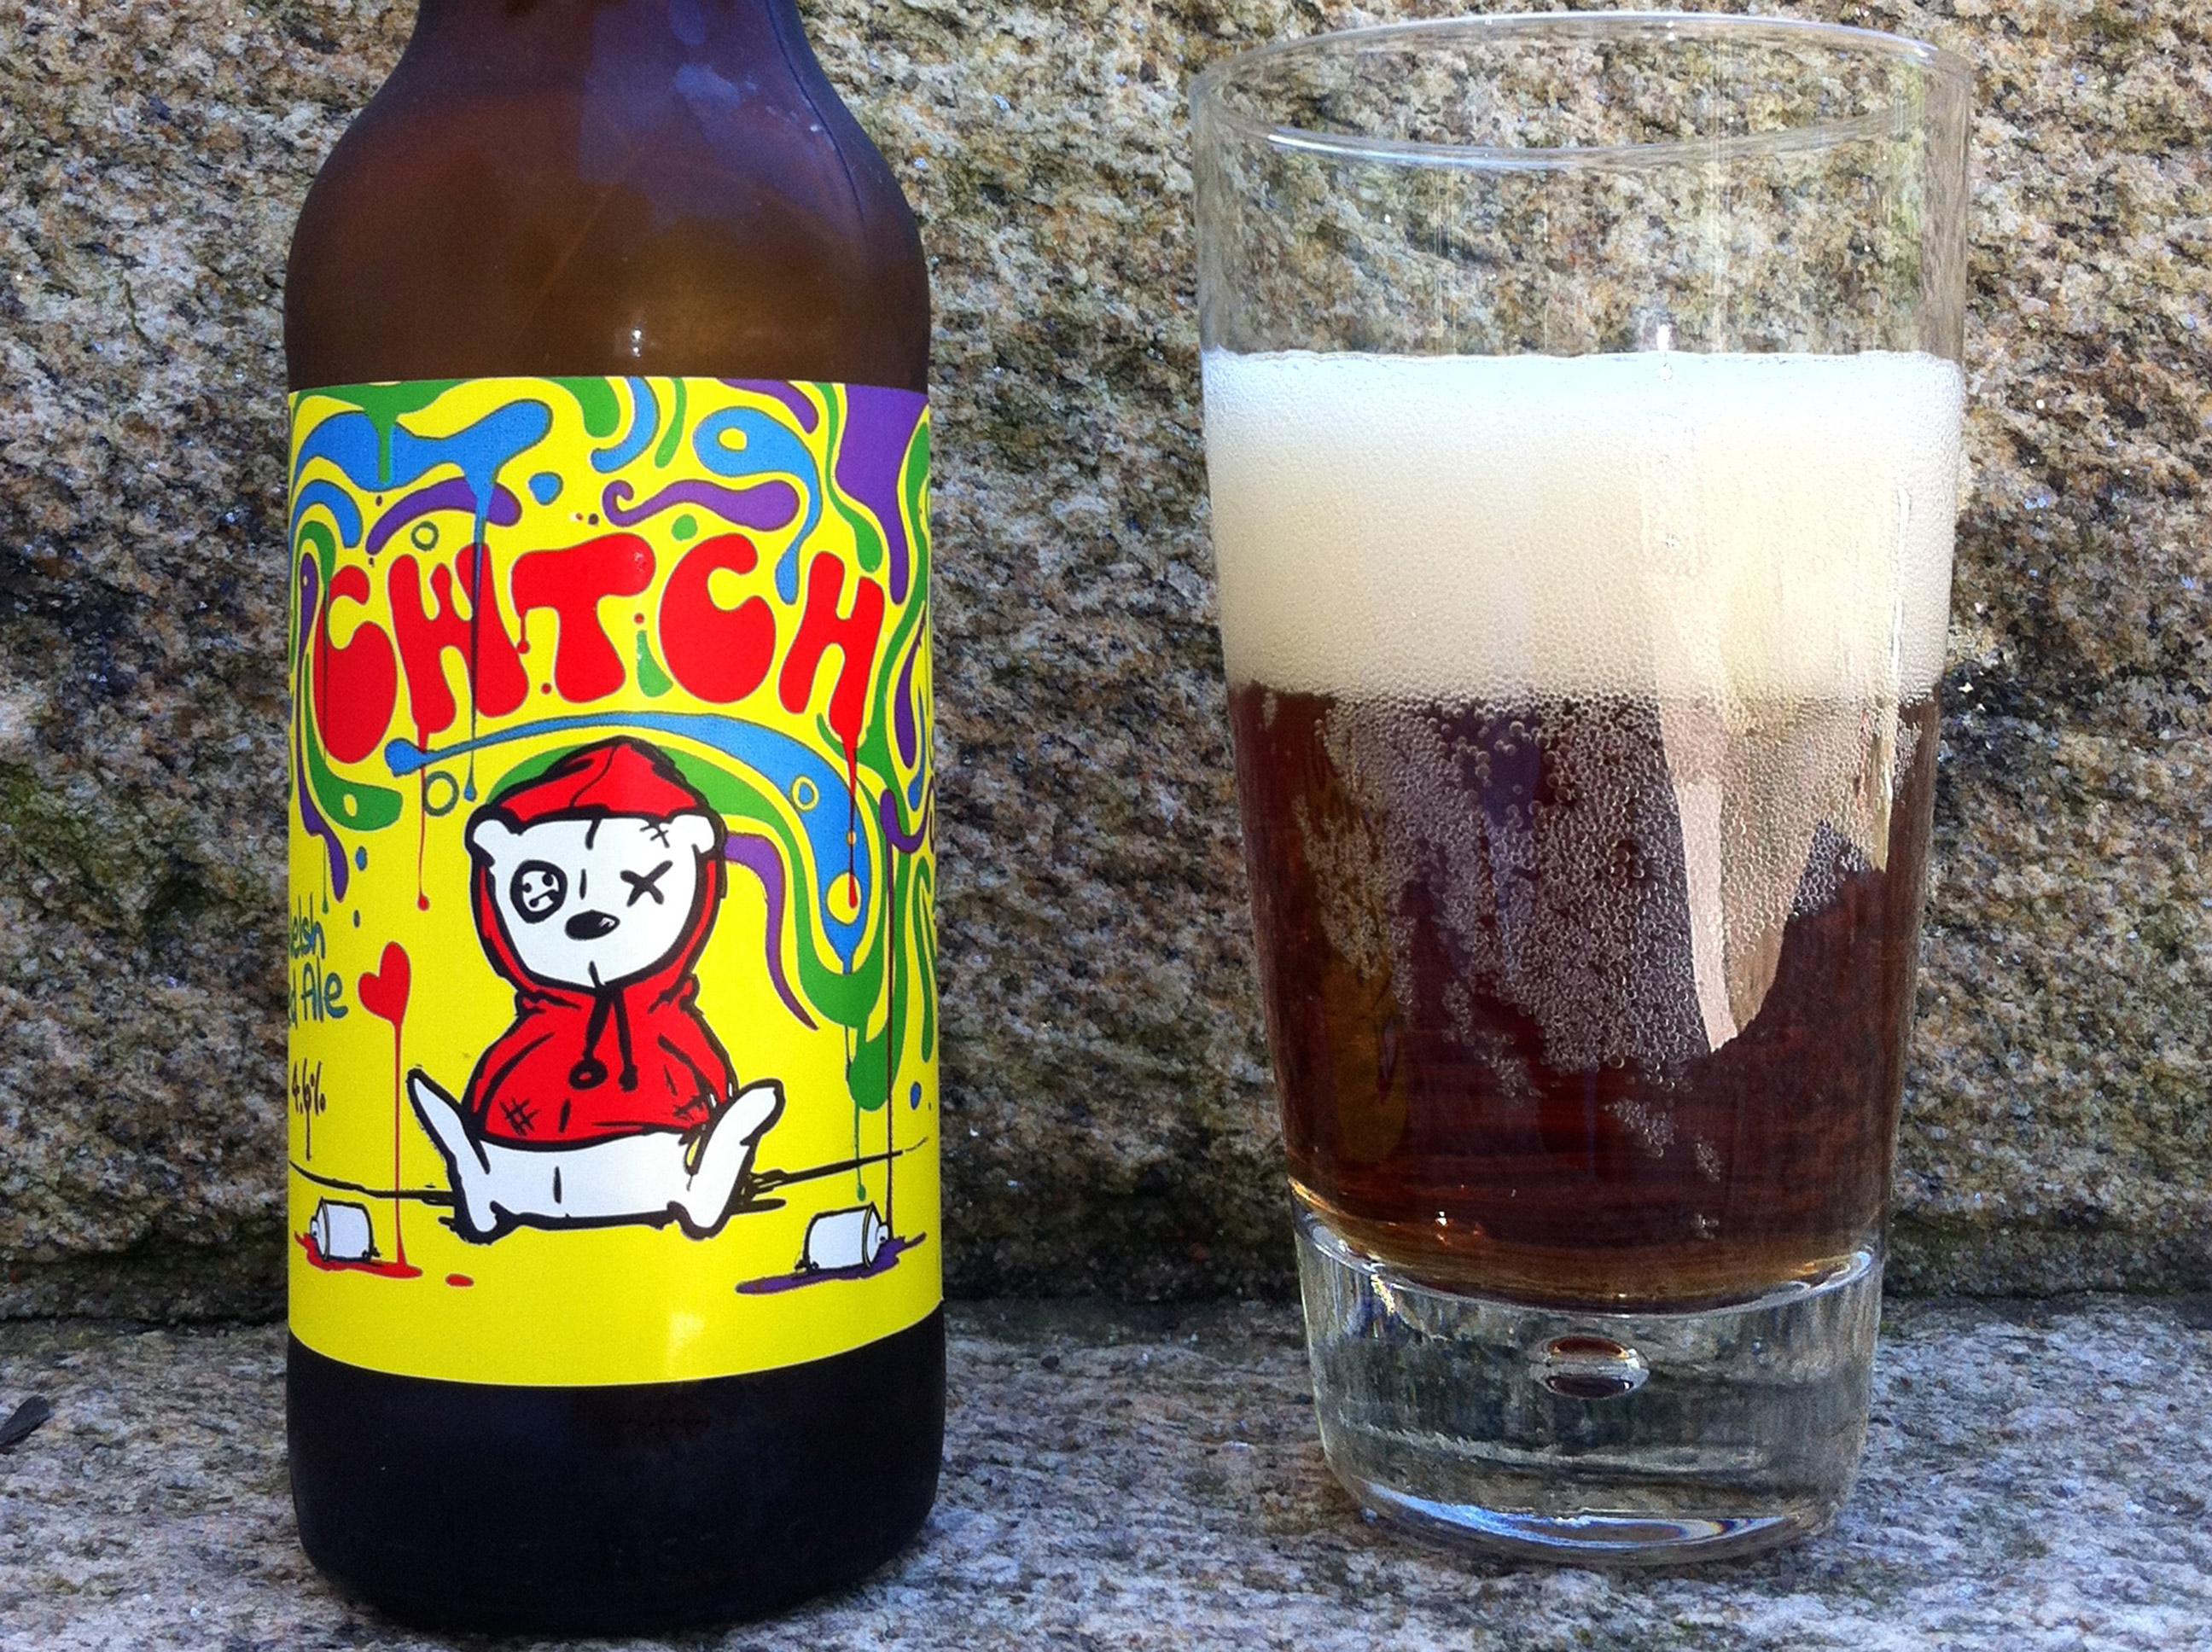 Tiny Rebel Pint Glass - Tiny Rebel Brewery